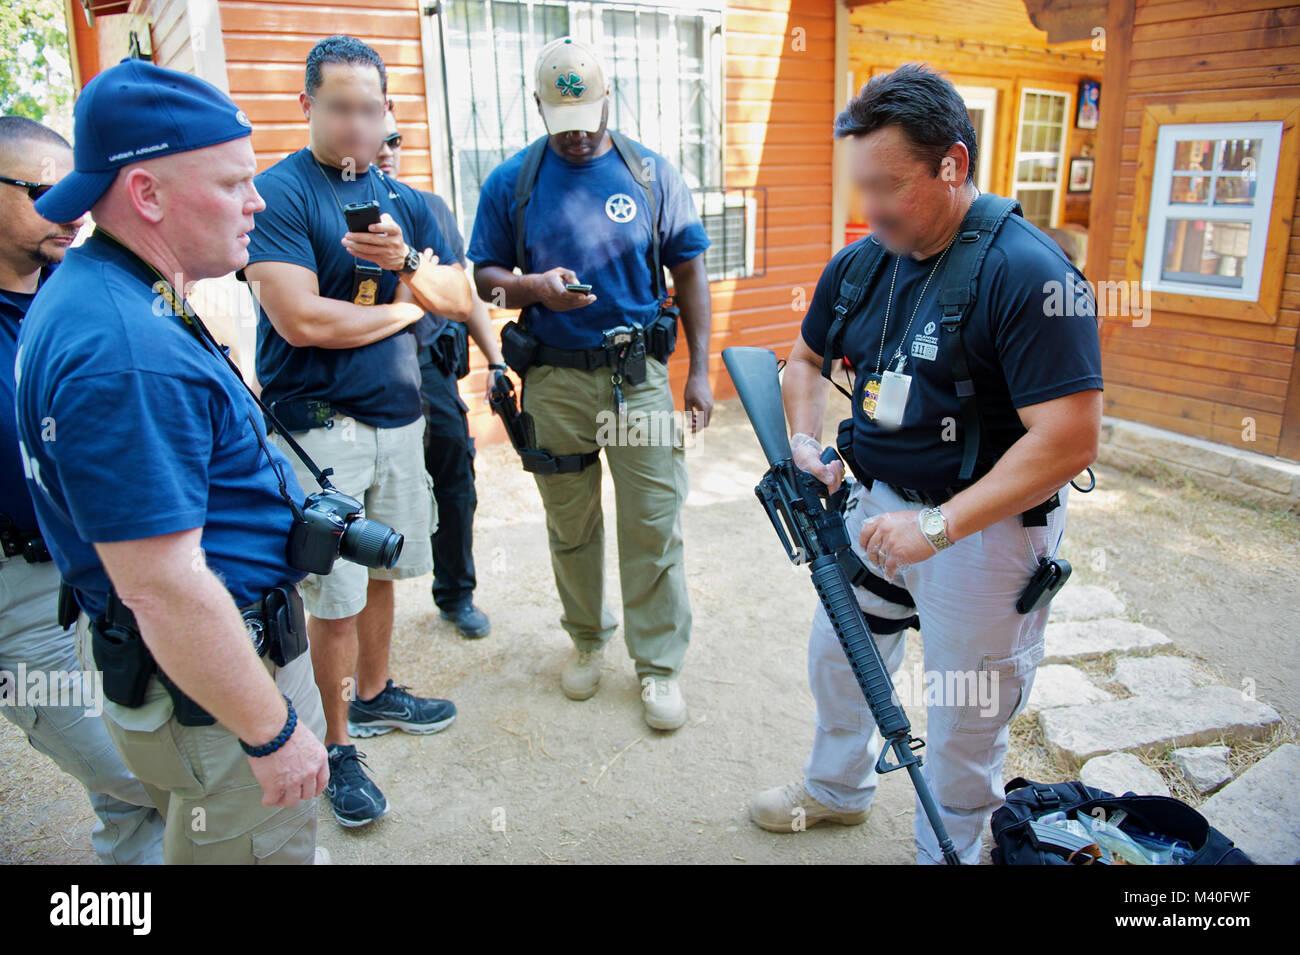 SAN ANTONIO - The U S  Marshals Service and the San Antonio